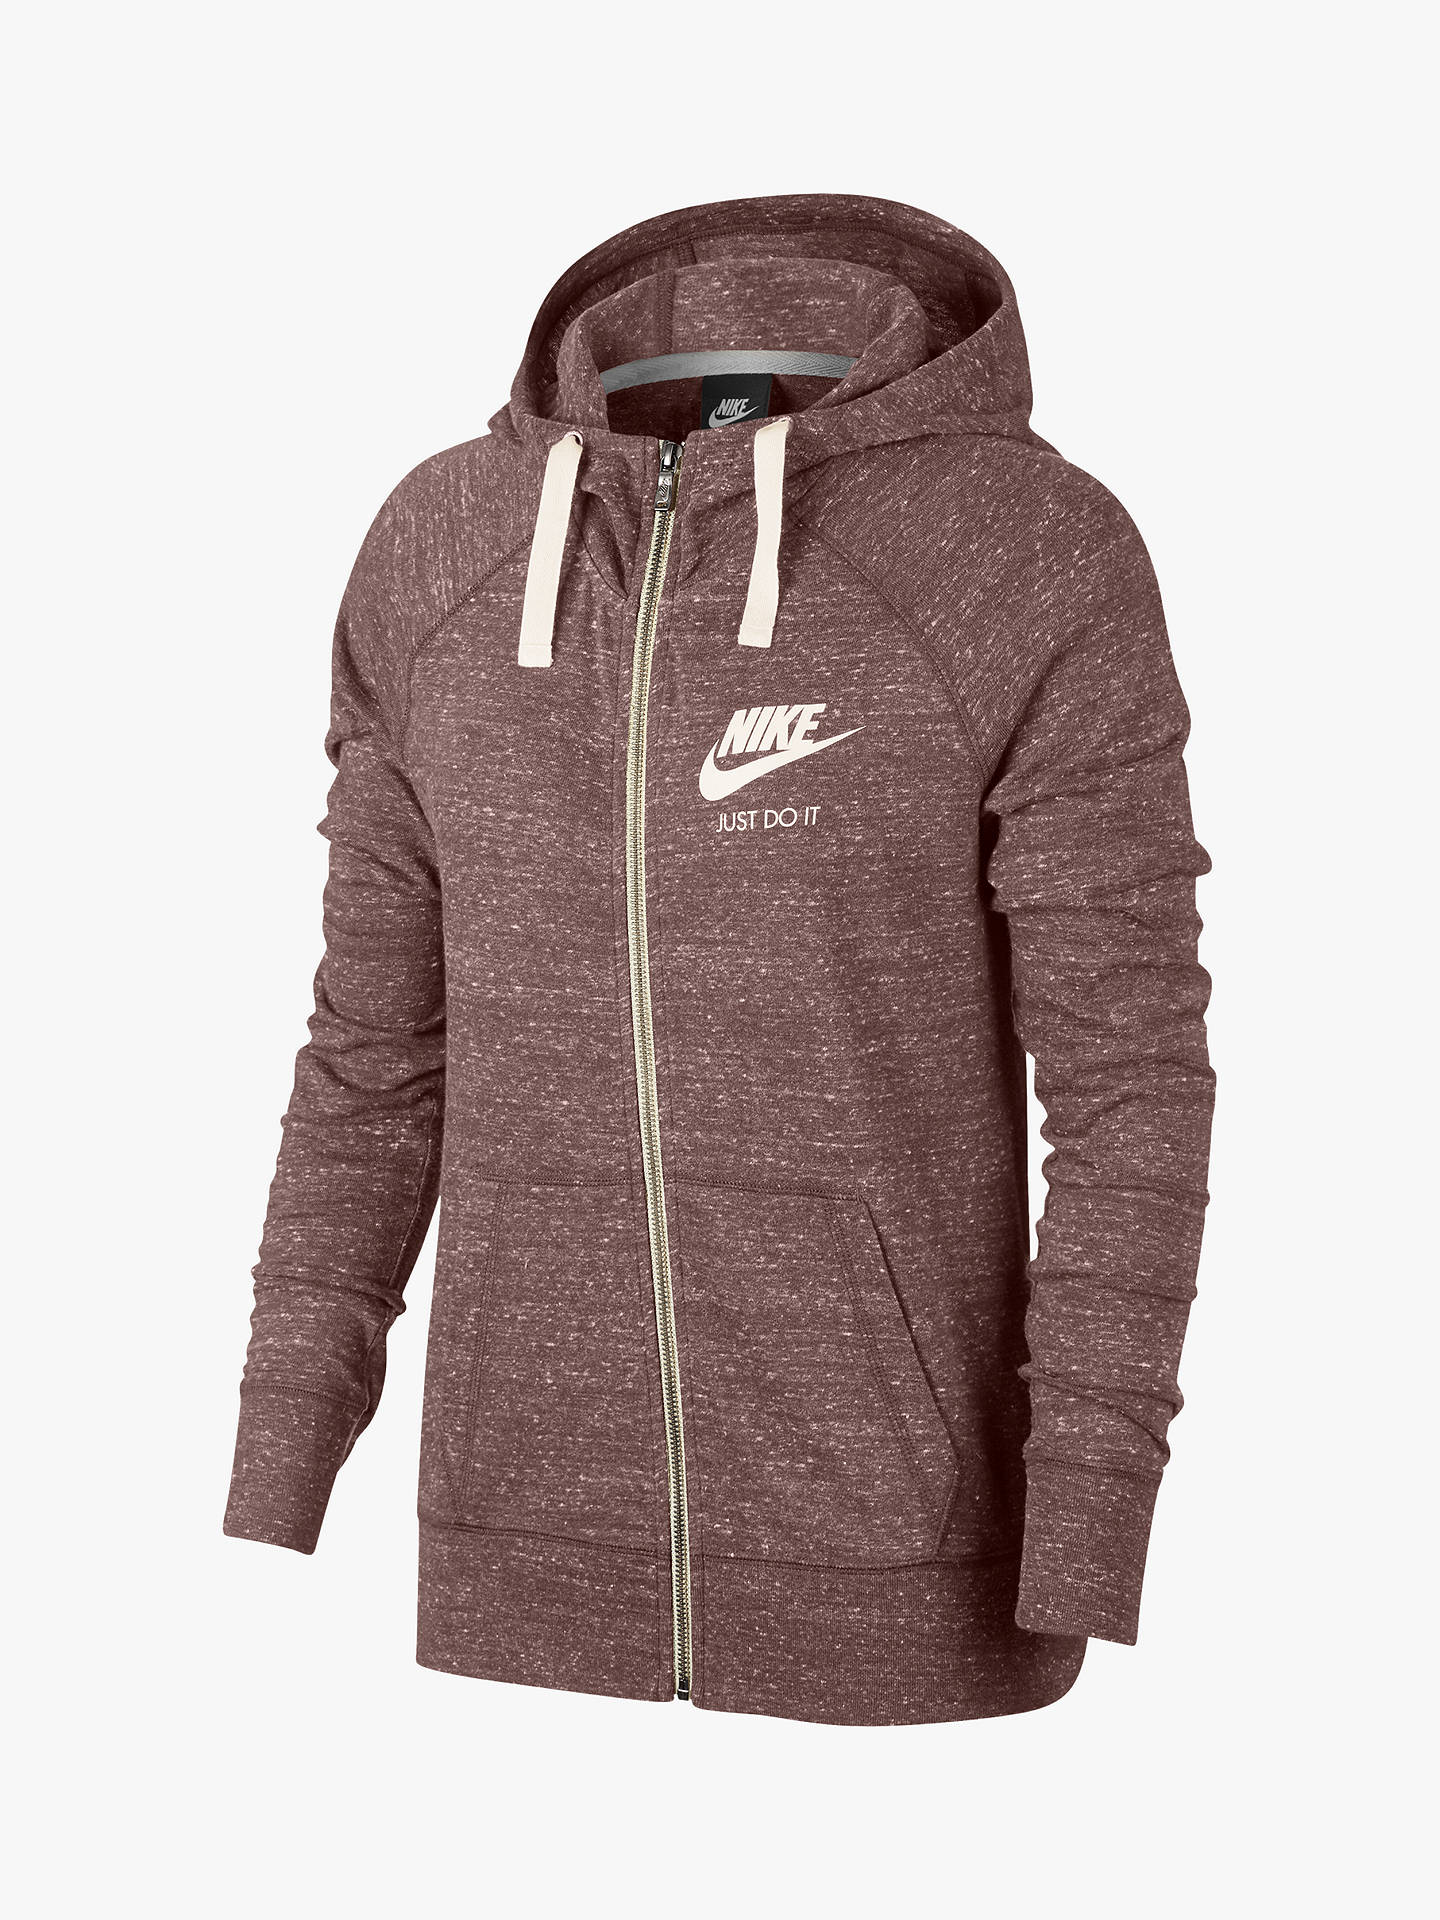 low priced 903a2 16999 Nike Sportswear Vintage Hoodie, Smokey Mauve/Sail at John ...